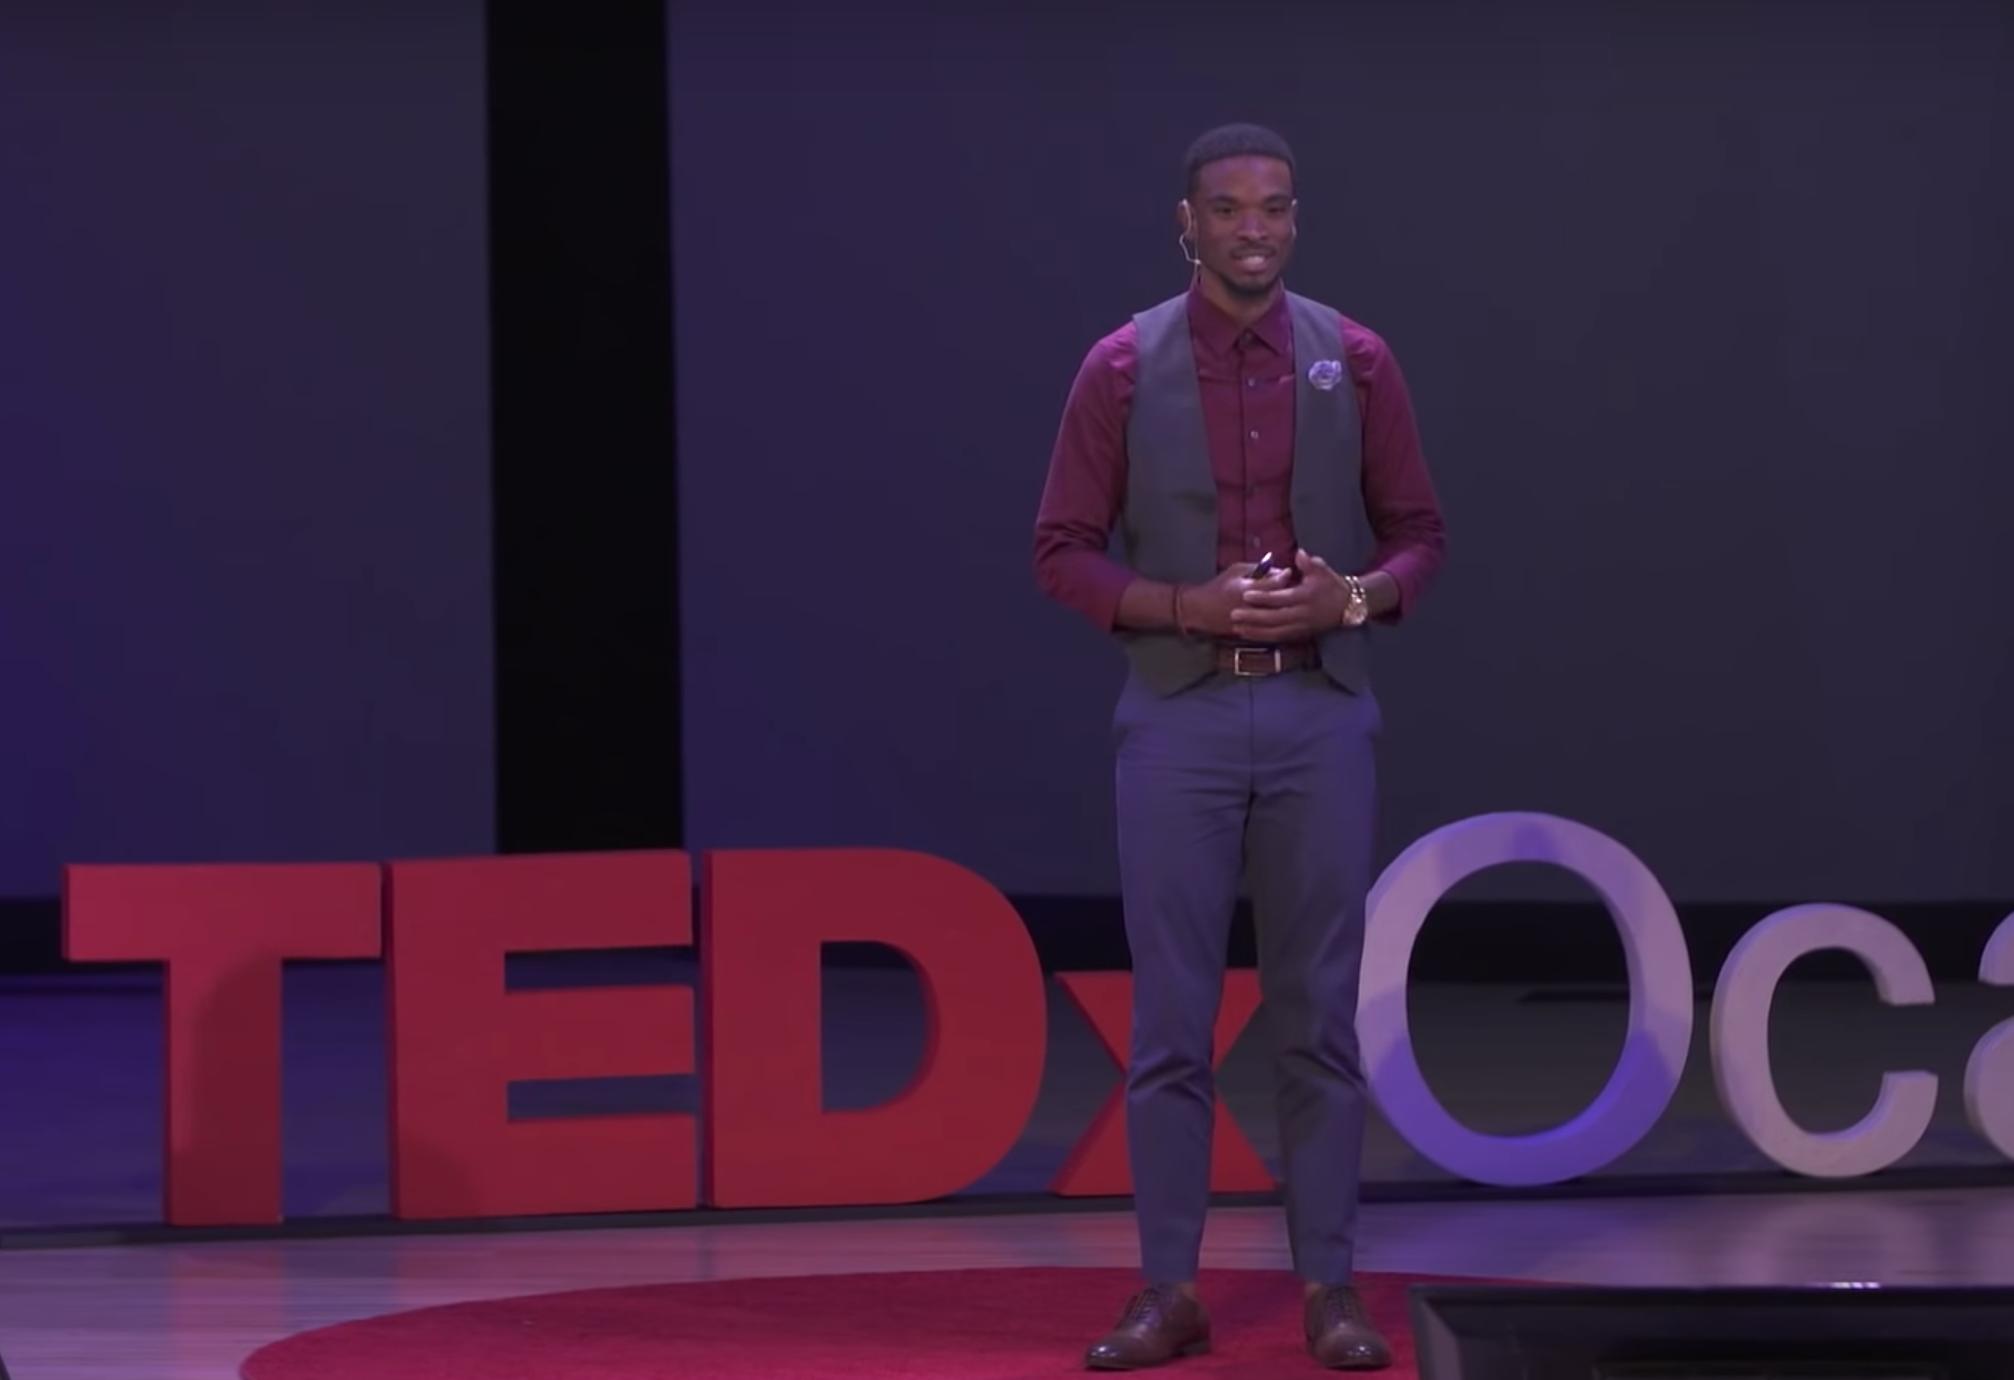 Caleb Chambliss giving TEDx talk